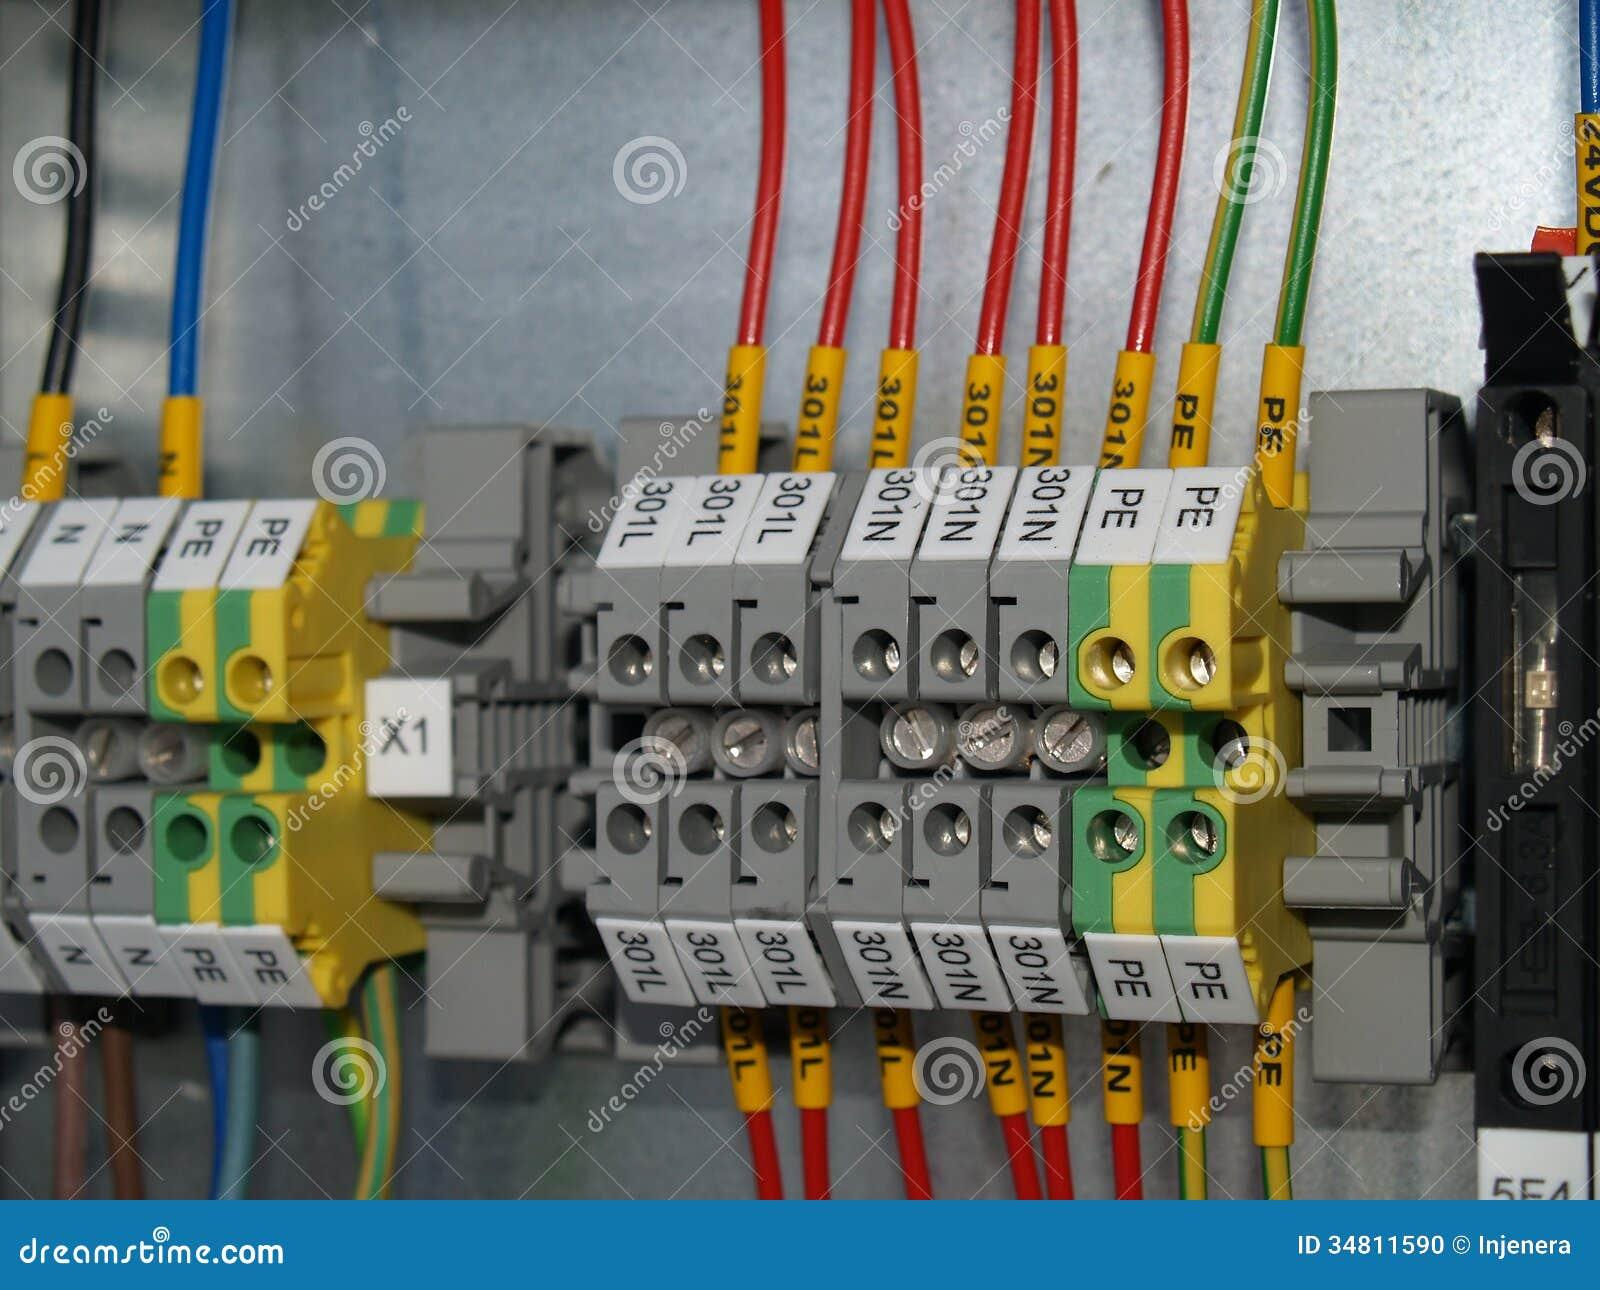 Rail Terminal Box Distribution Clamps on Lighting Junction Box